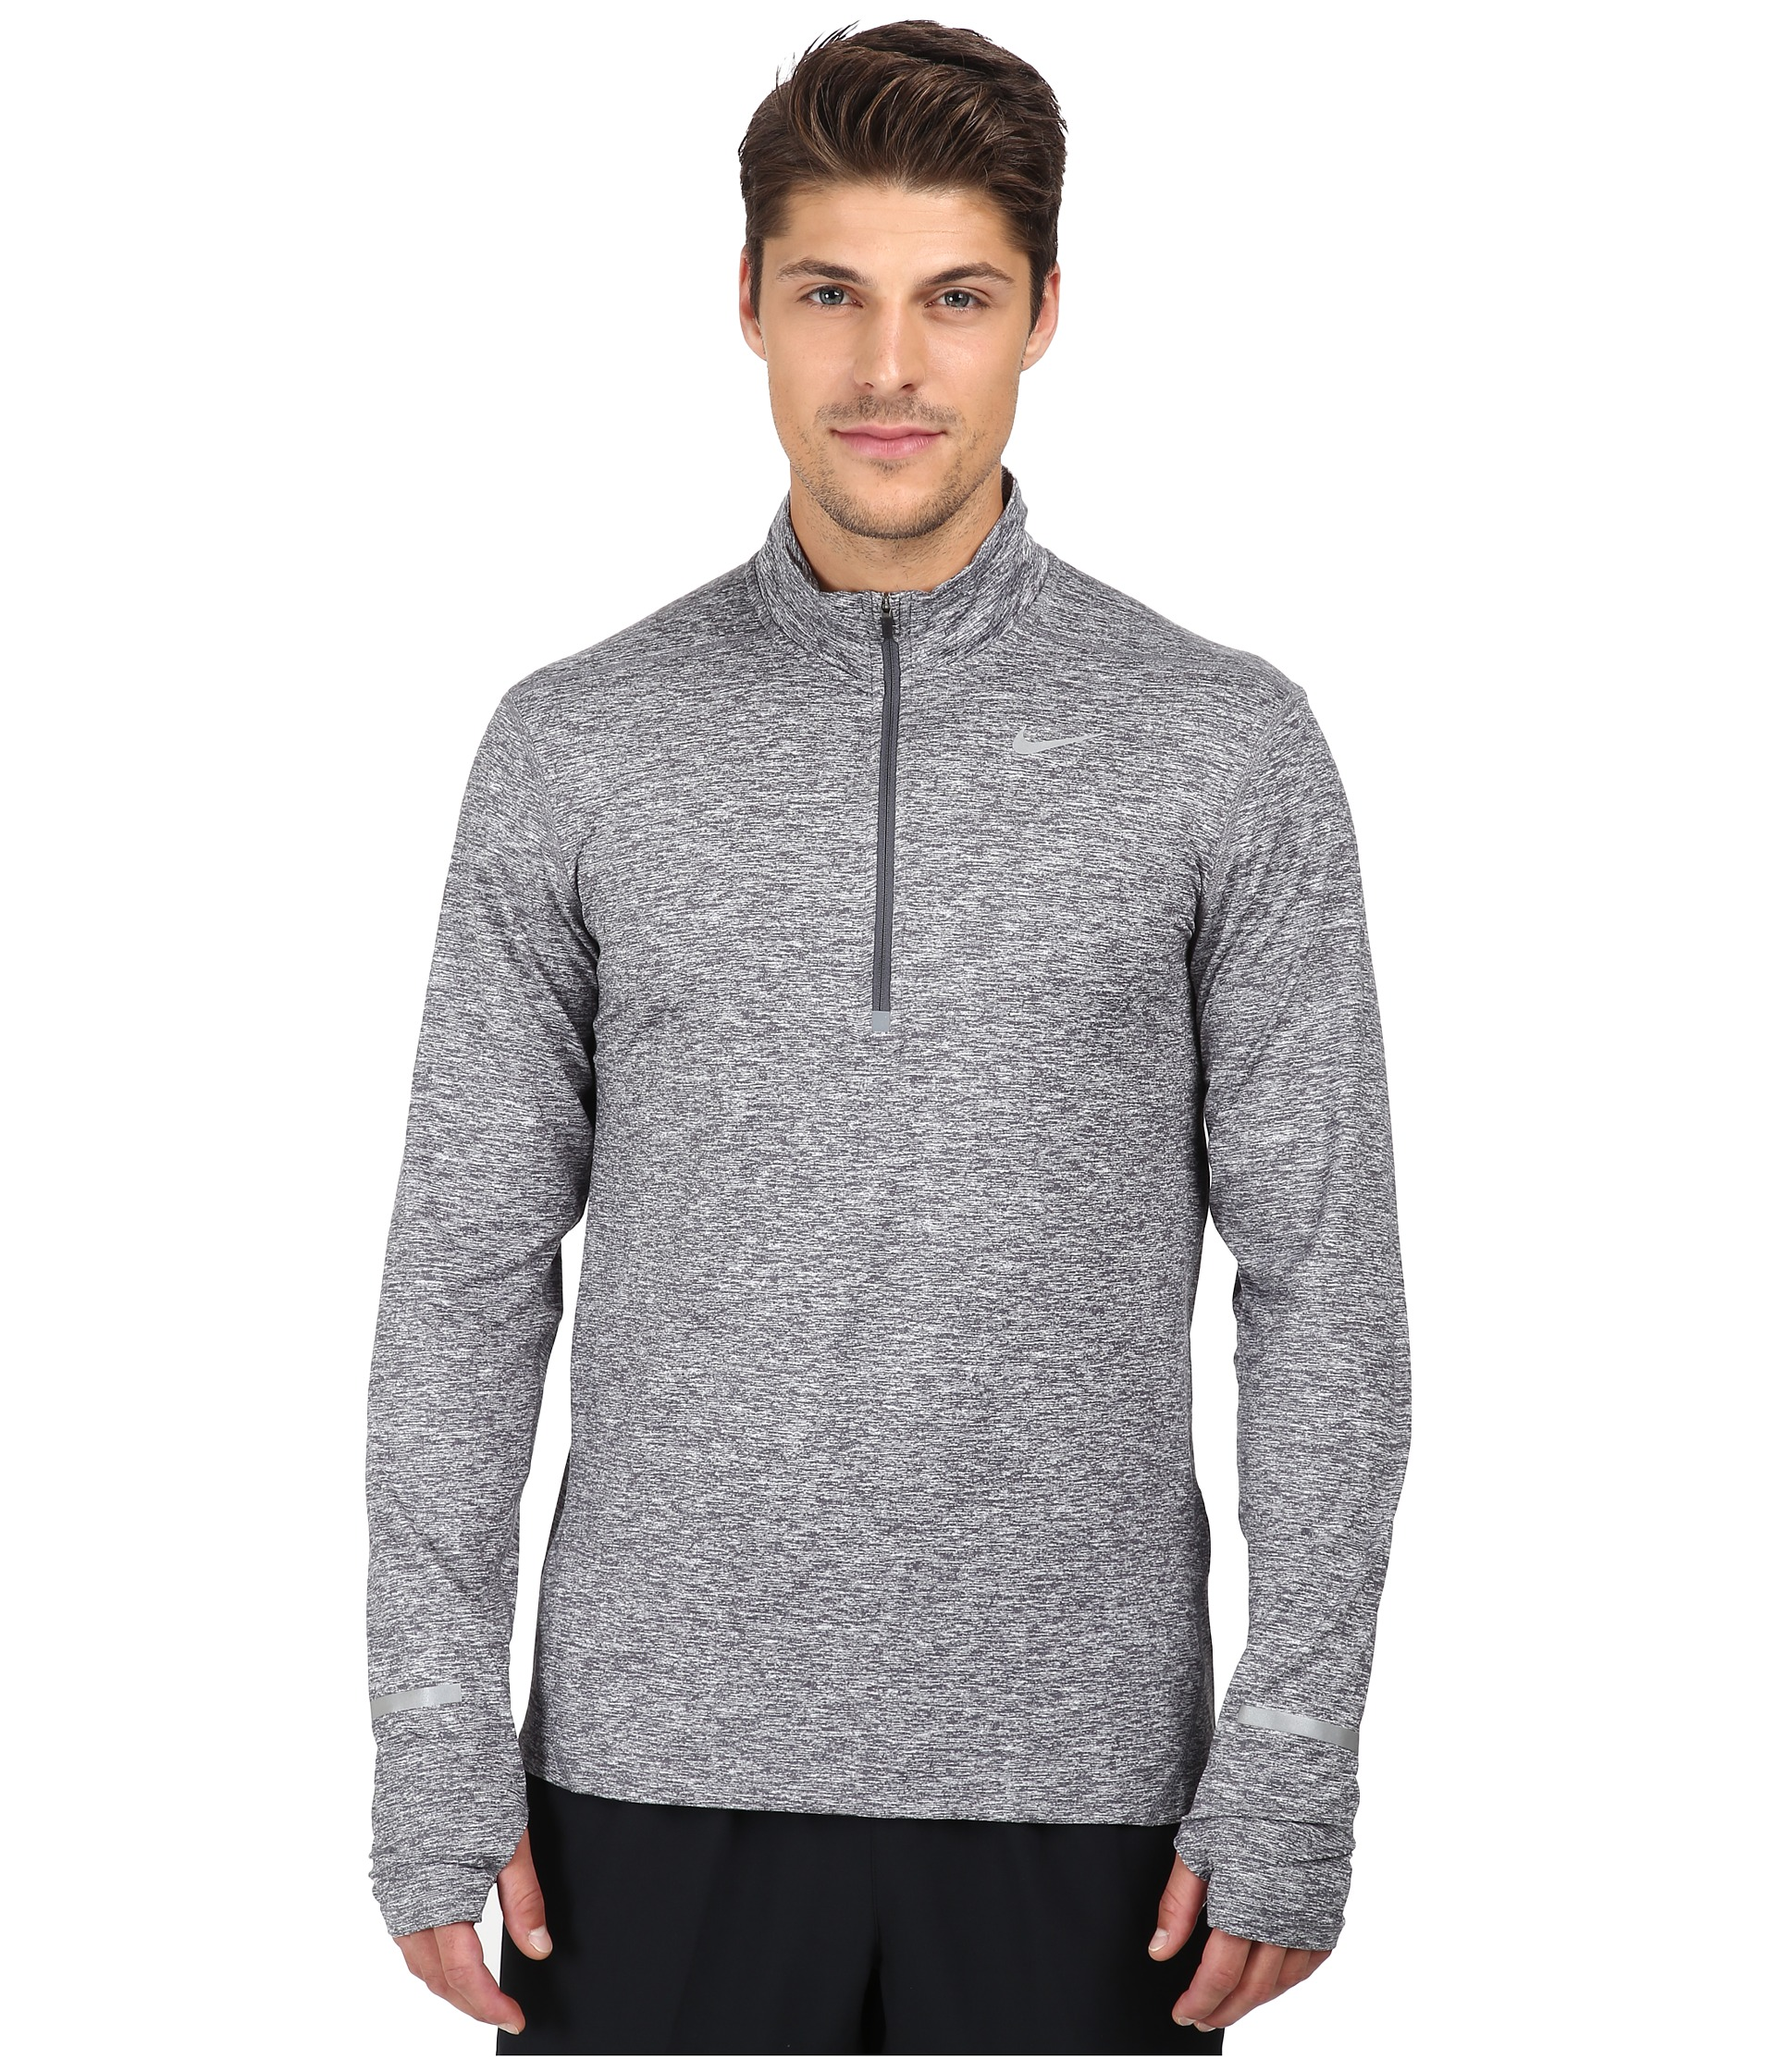 Nike element jacket men's - Nike Dry Element Long Sleeve Running Top